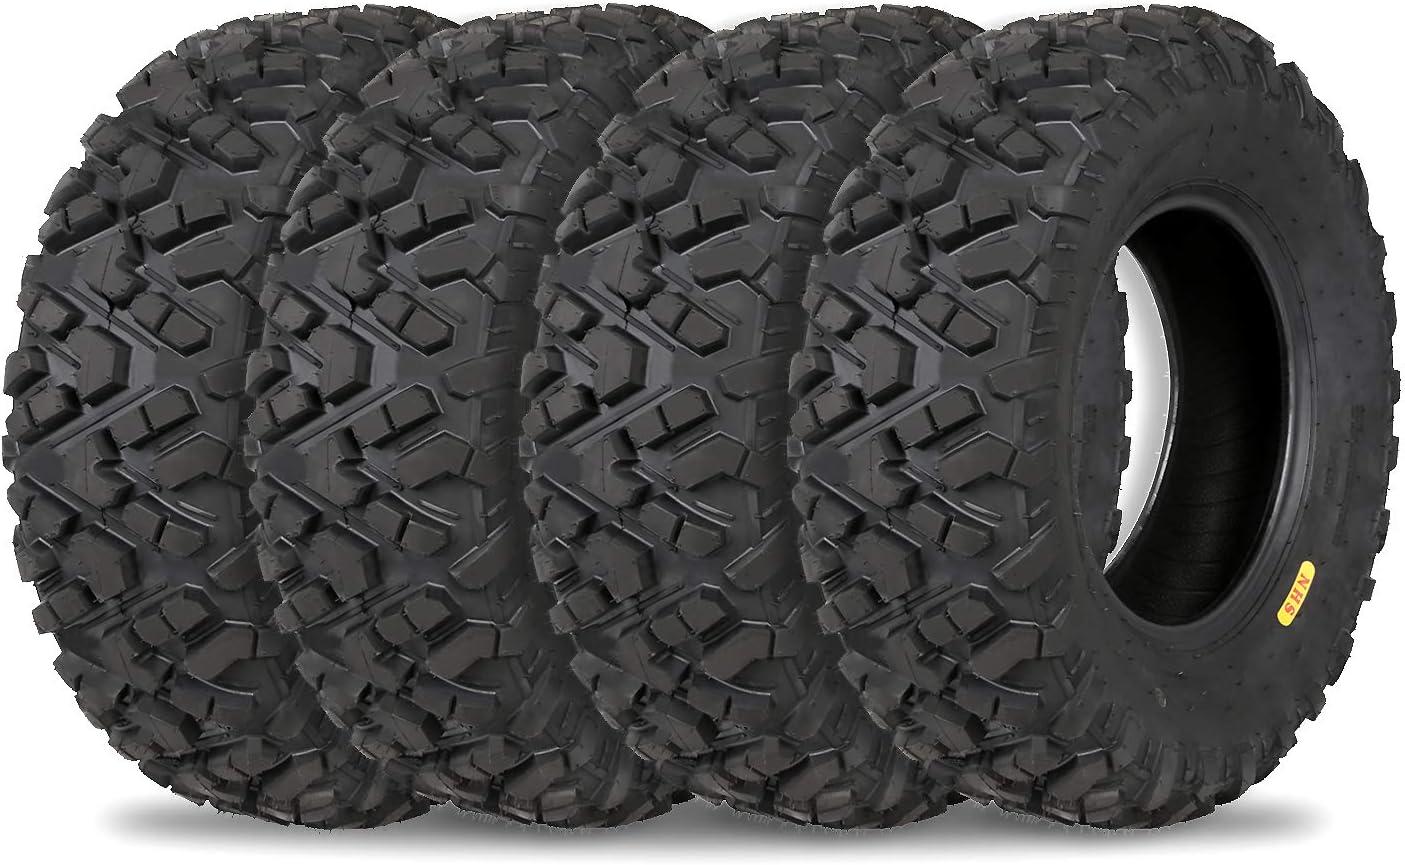 Weize All Terrain UTV Tires